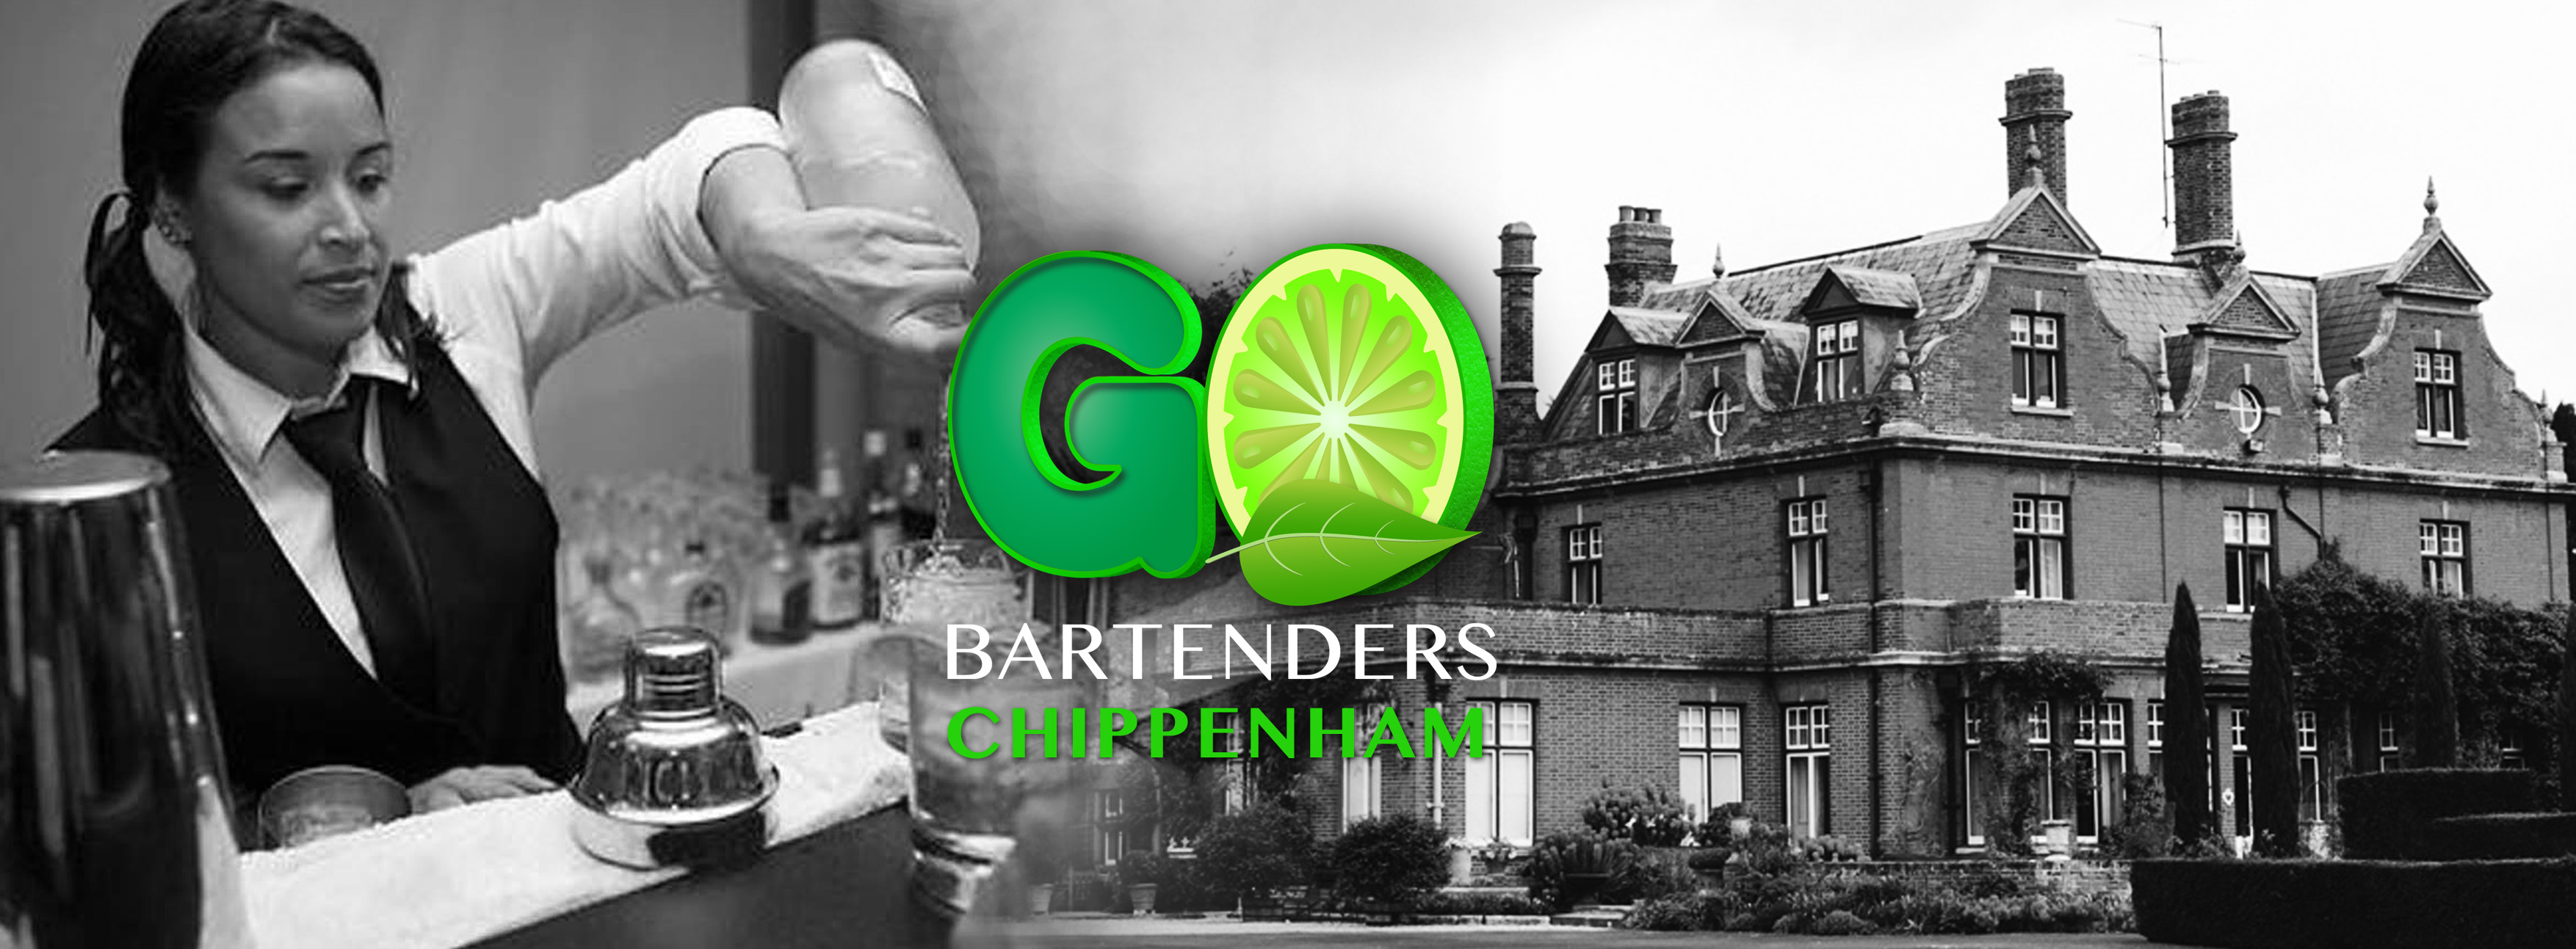 Chippenham bartender hire.